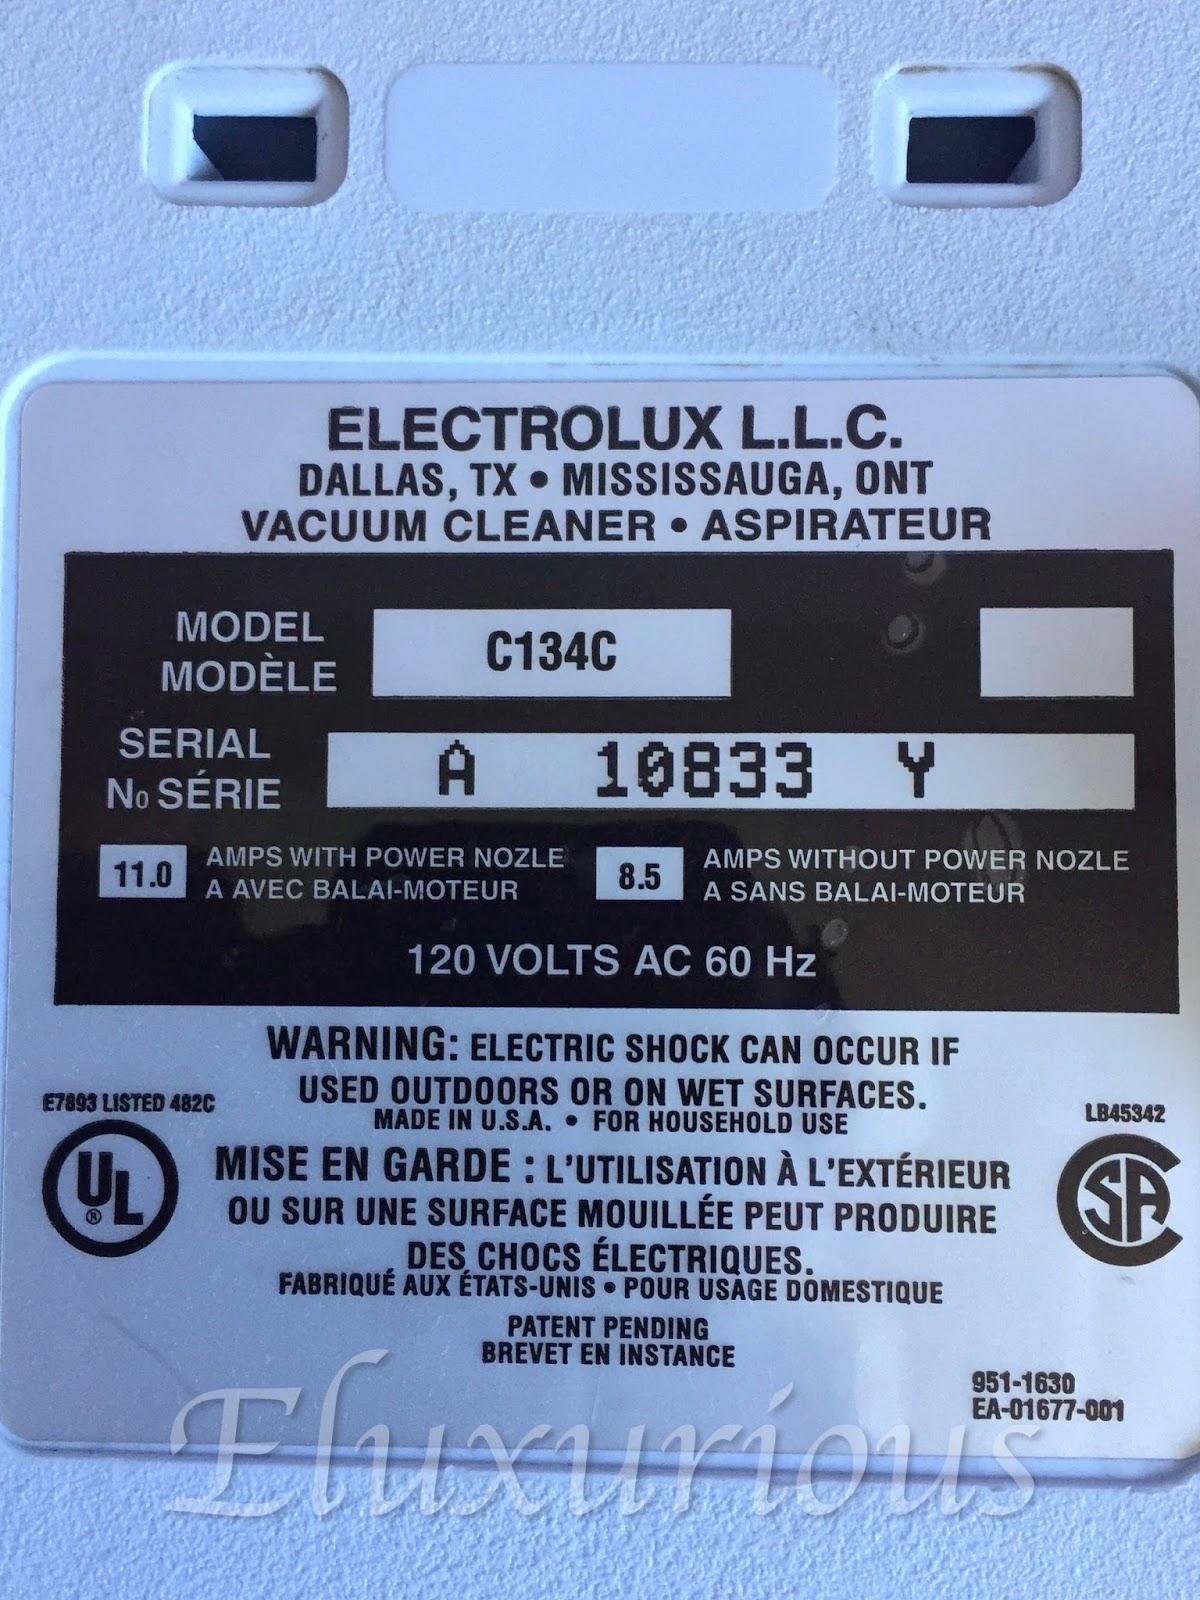 electrolux 2100 wiring diagram dolgular com Panasonic Wiring Diagrams  Factory Stereo Wiring Diagrams Model Train Wiring Diagrams Oreck Vac Wiring Diagrams